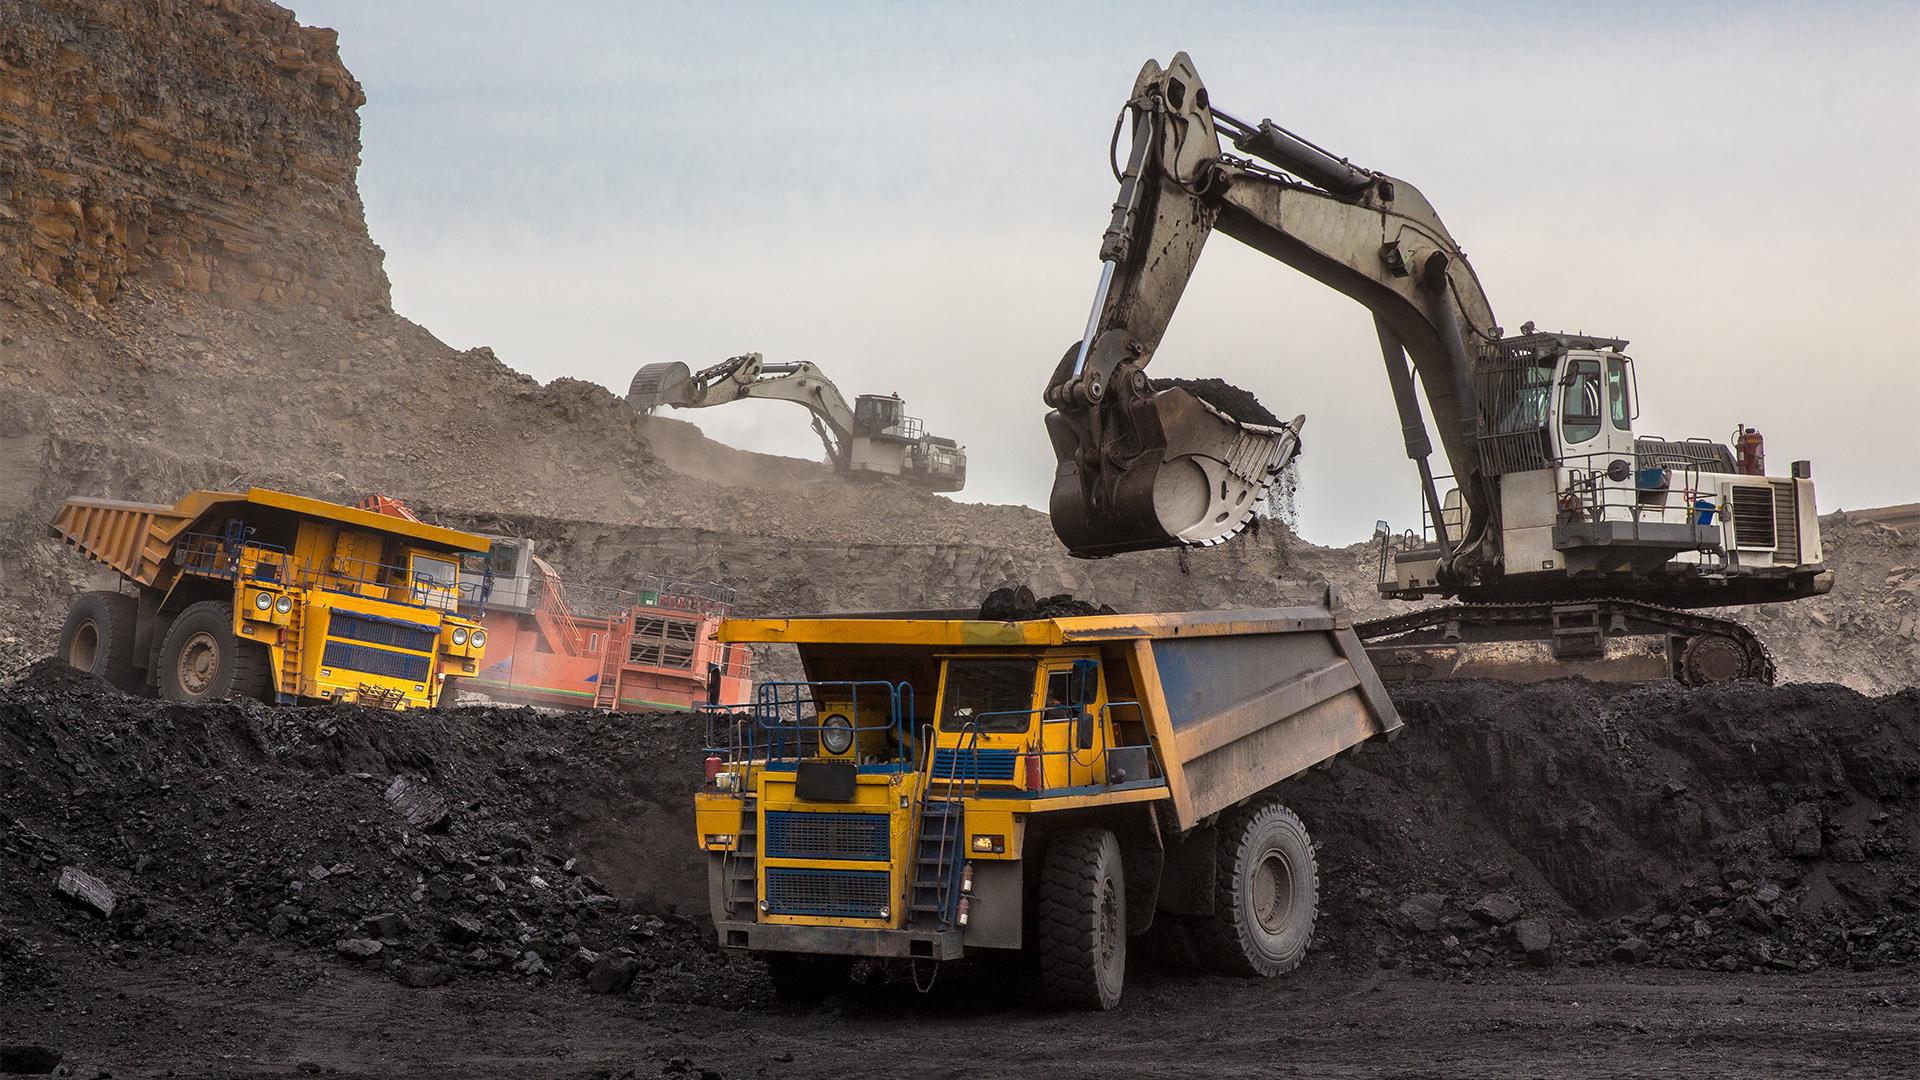 St Barbara Mining (ASX:SBM) Q4 production guidance achieved